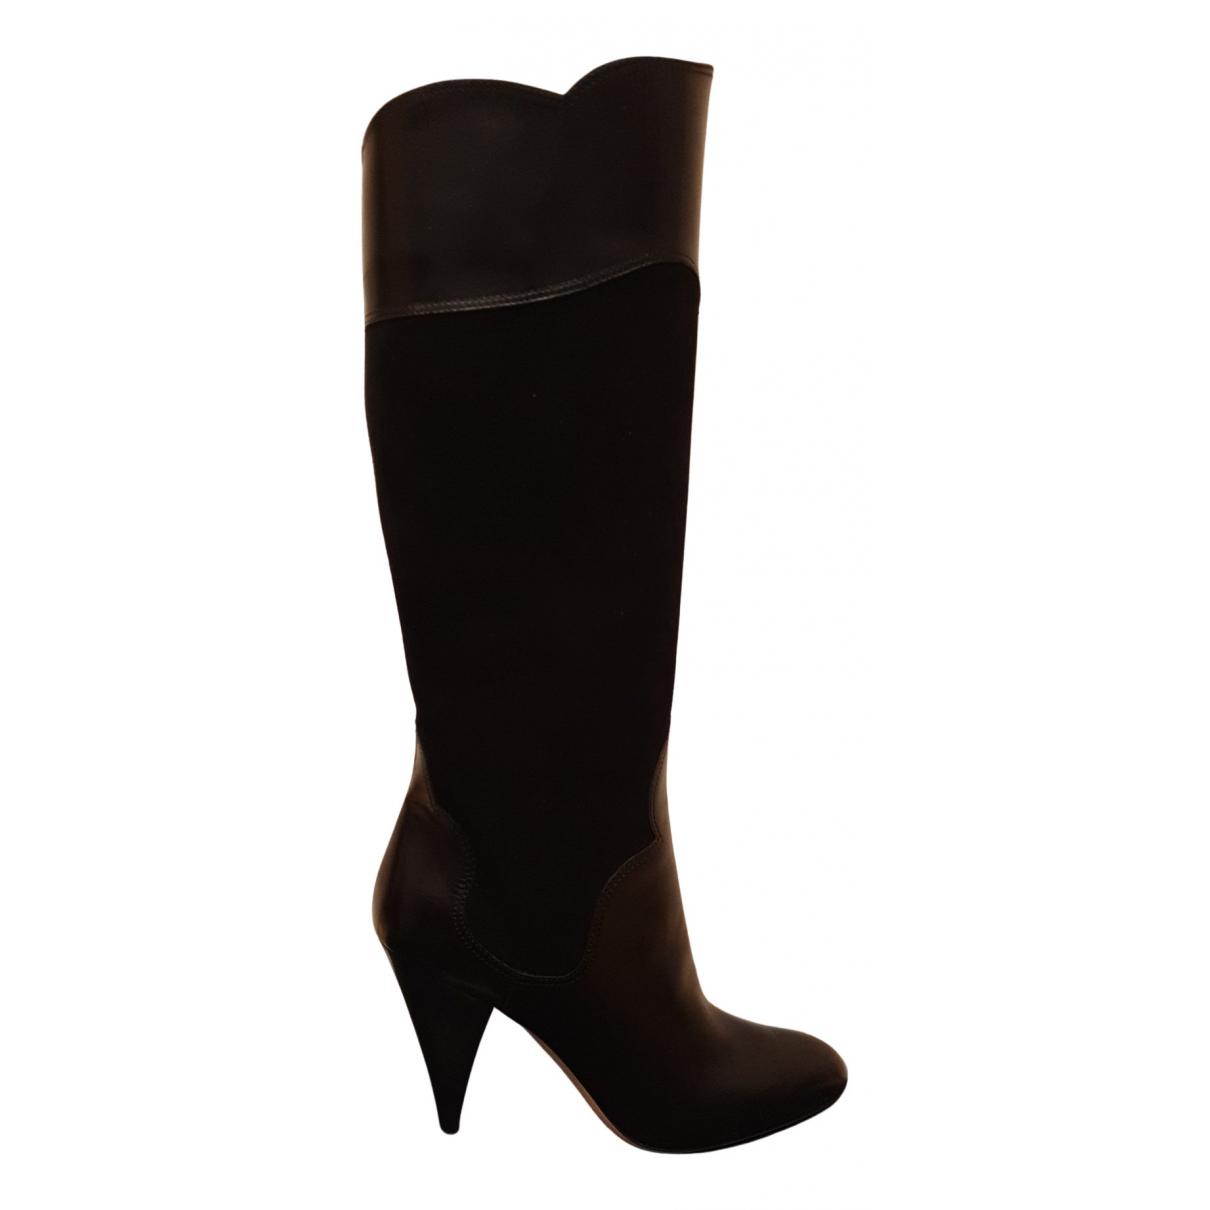 Oscar De La Renta N Black Suede Boots for Women 37.5 EU